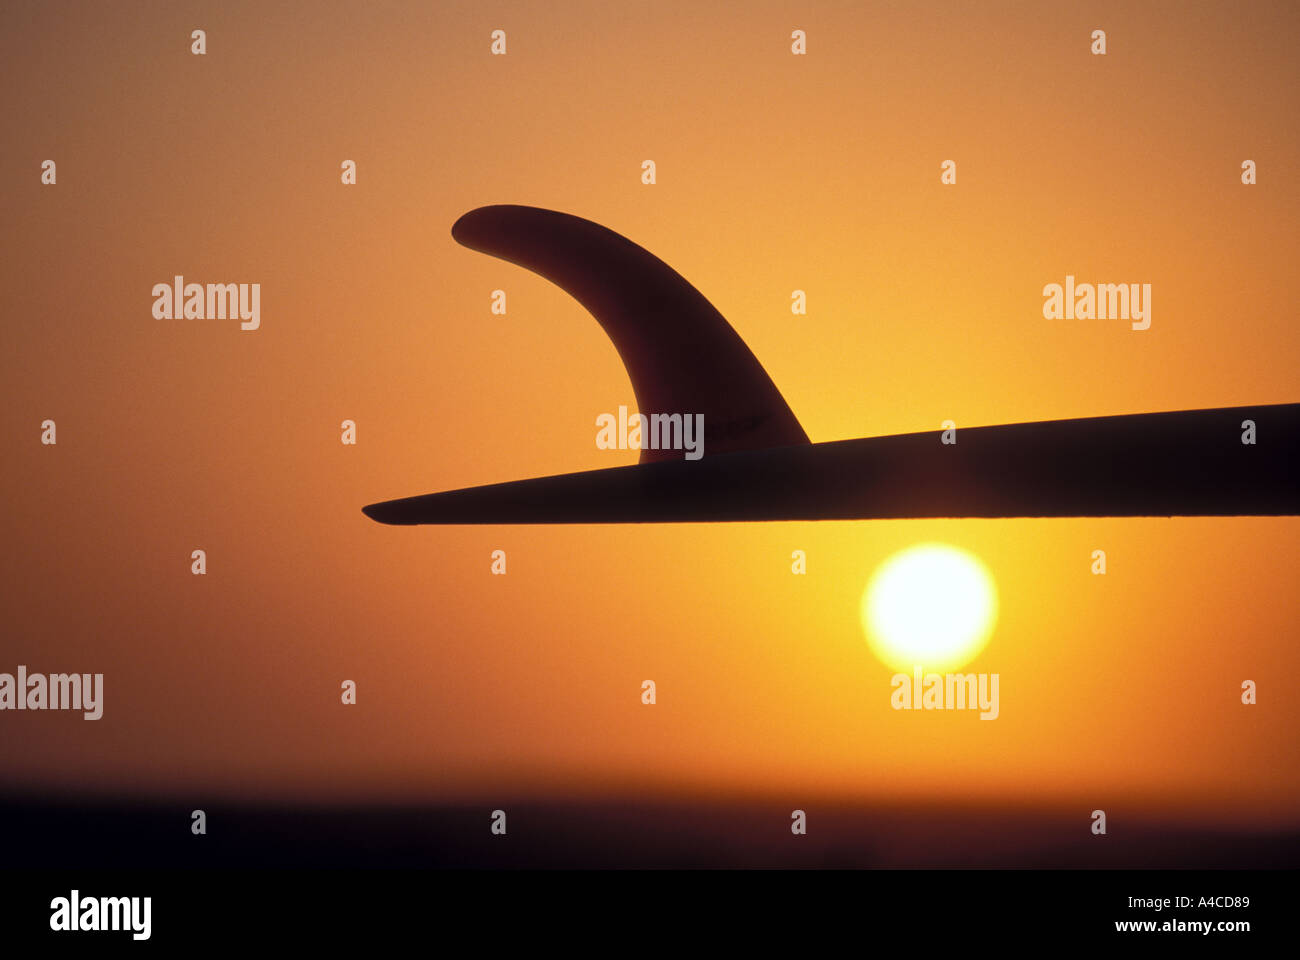 Surfbrett gesehen im Sonnenuntergang Kalifornien USA Stockbild